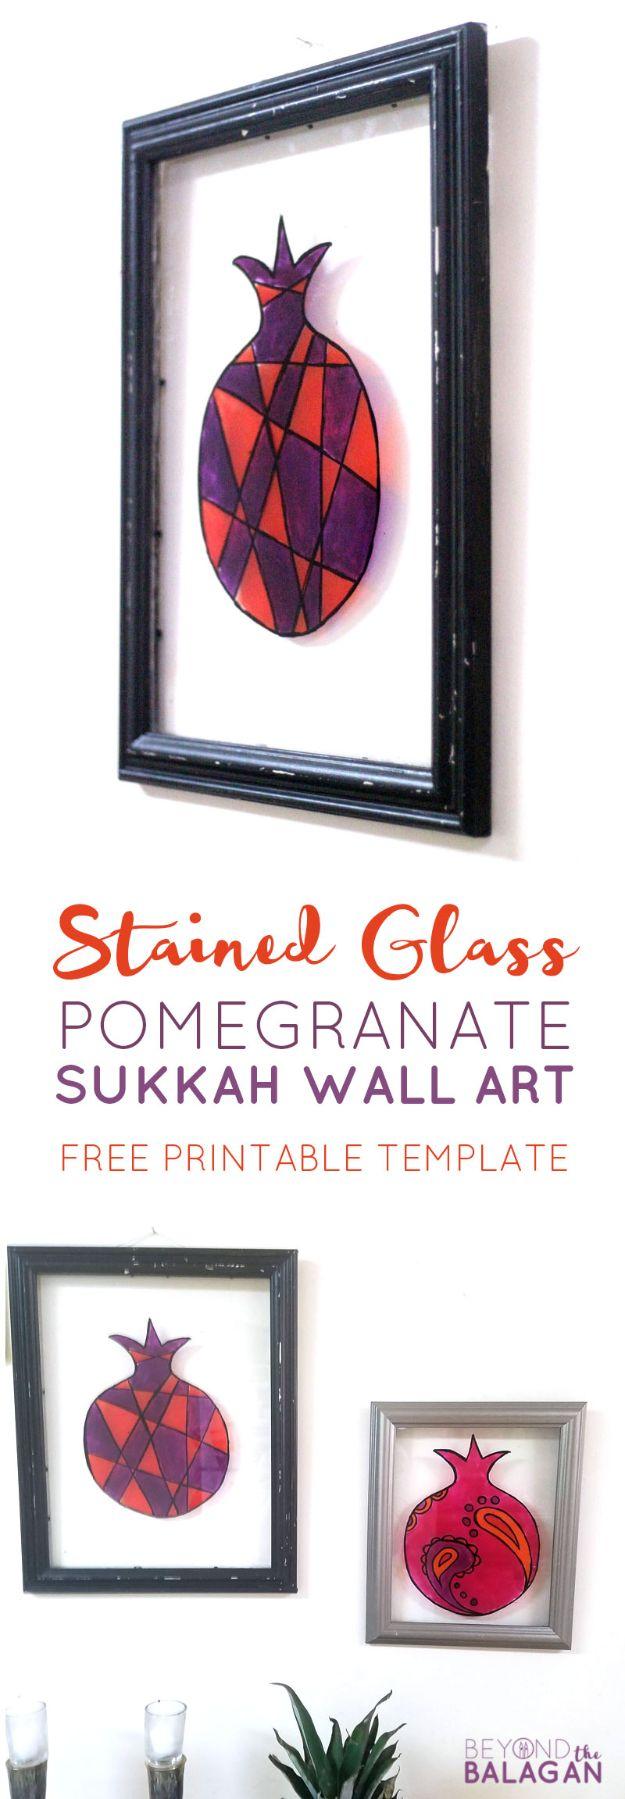 DIY Wall Art Ideas for Teens - Stained Glass Pomegranate Sukkah Wall Art - Teen Boy and Girl Bedroom Wall Decor Ideas - Goedkope canvasschilderijen en wandkleden voor kamerdecoratie